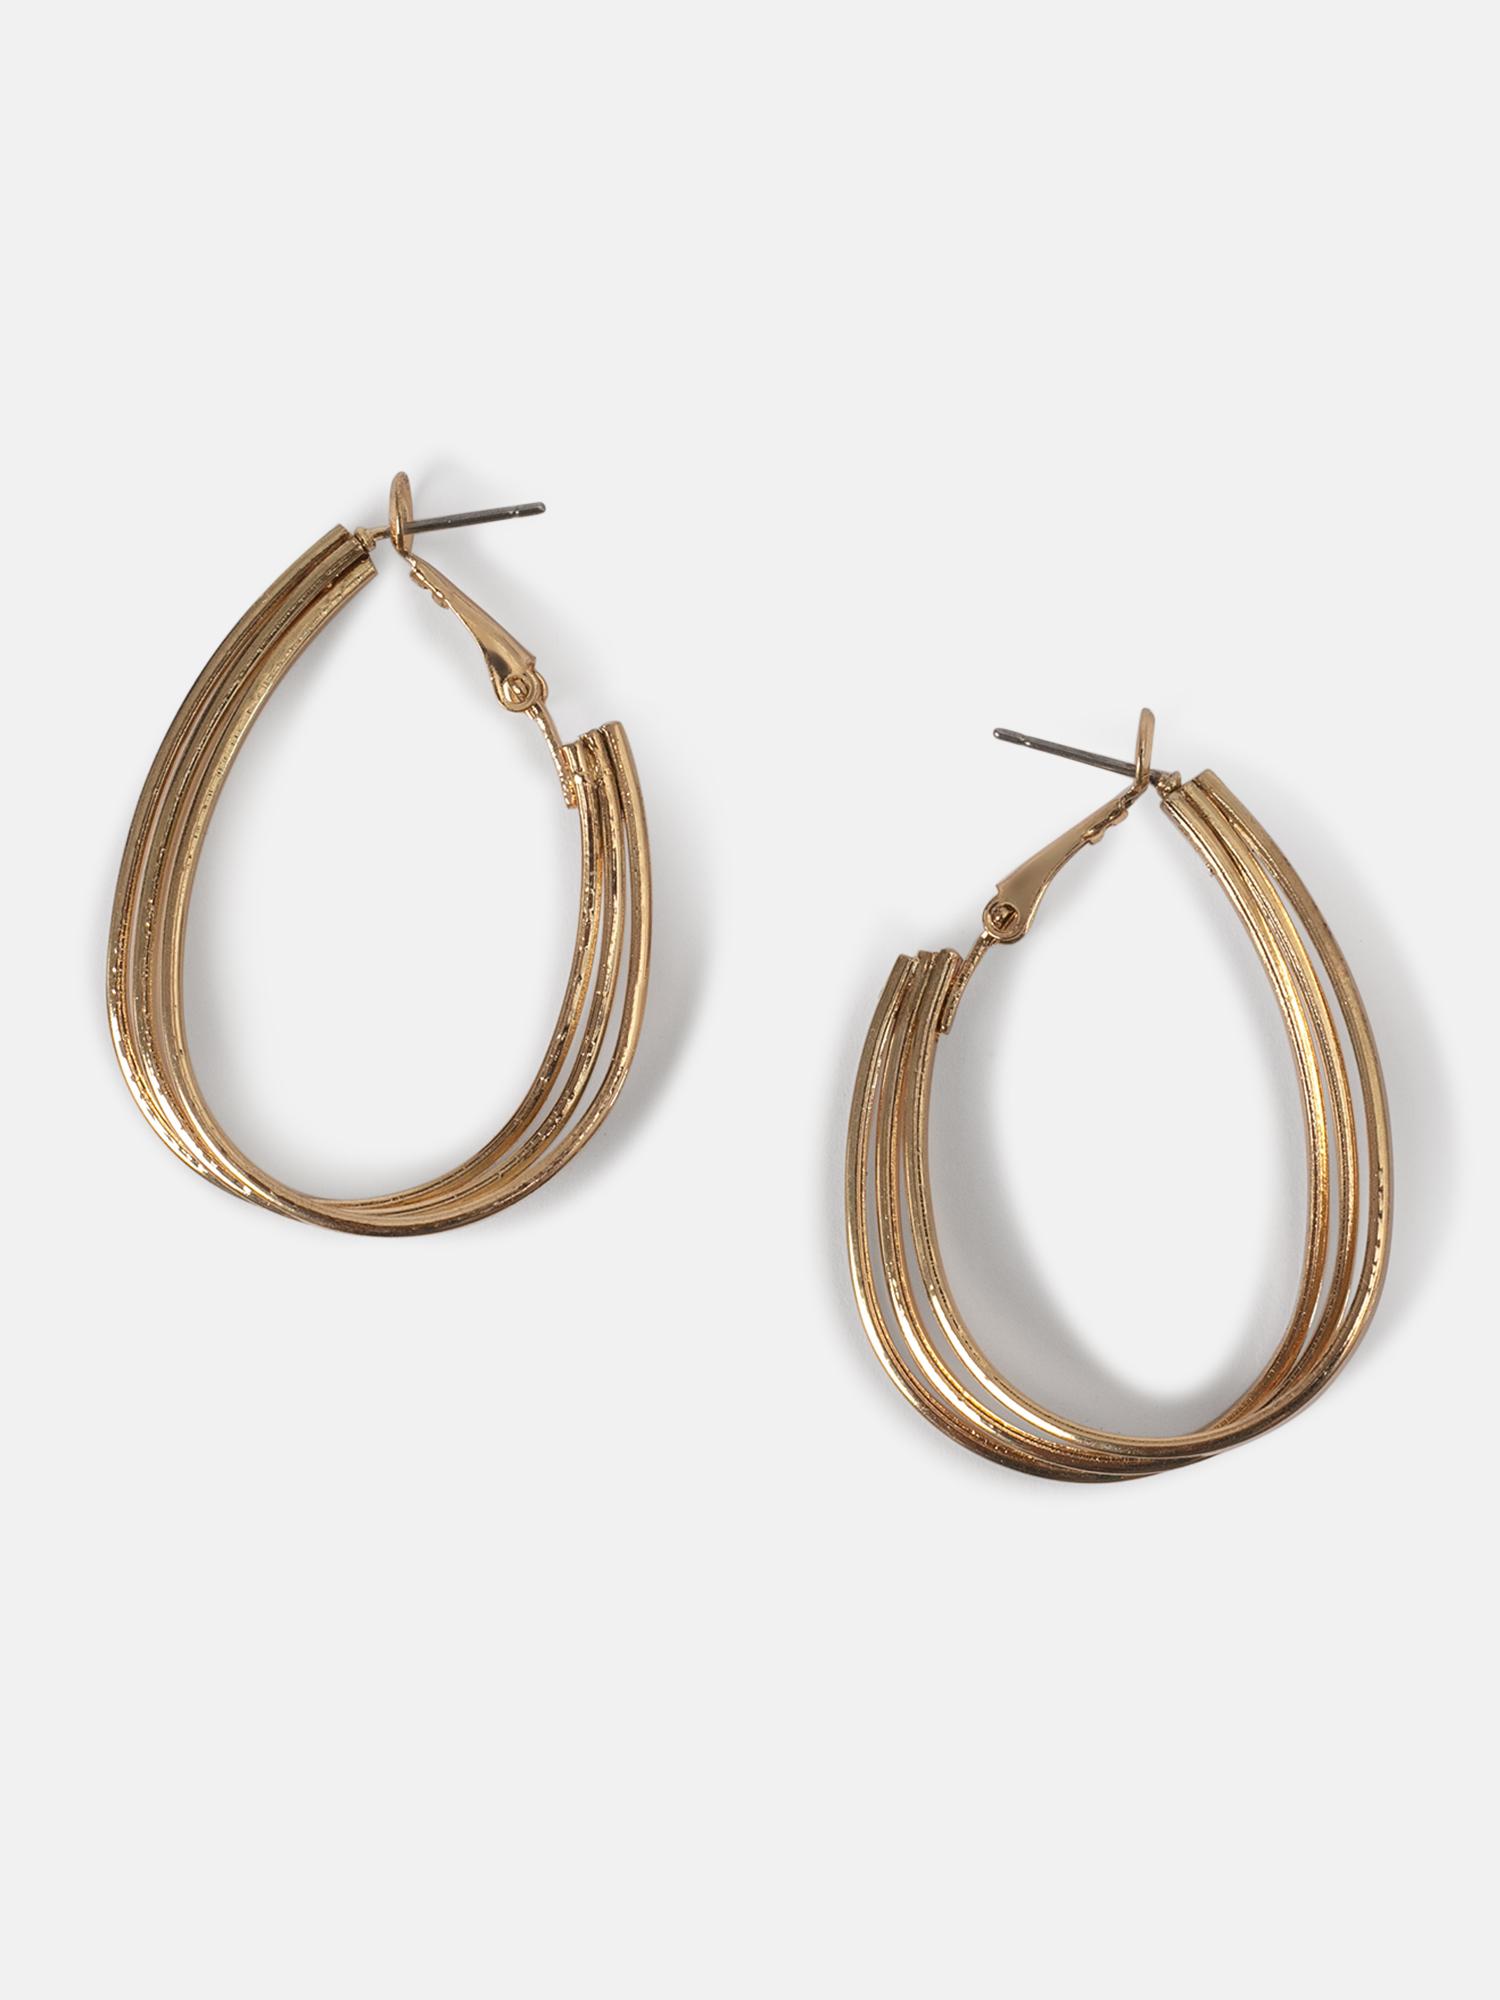 Earrings-The Stylish Trio Hoop Earrings1